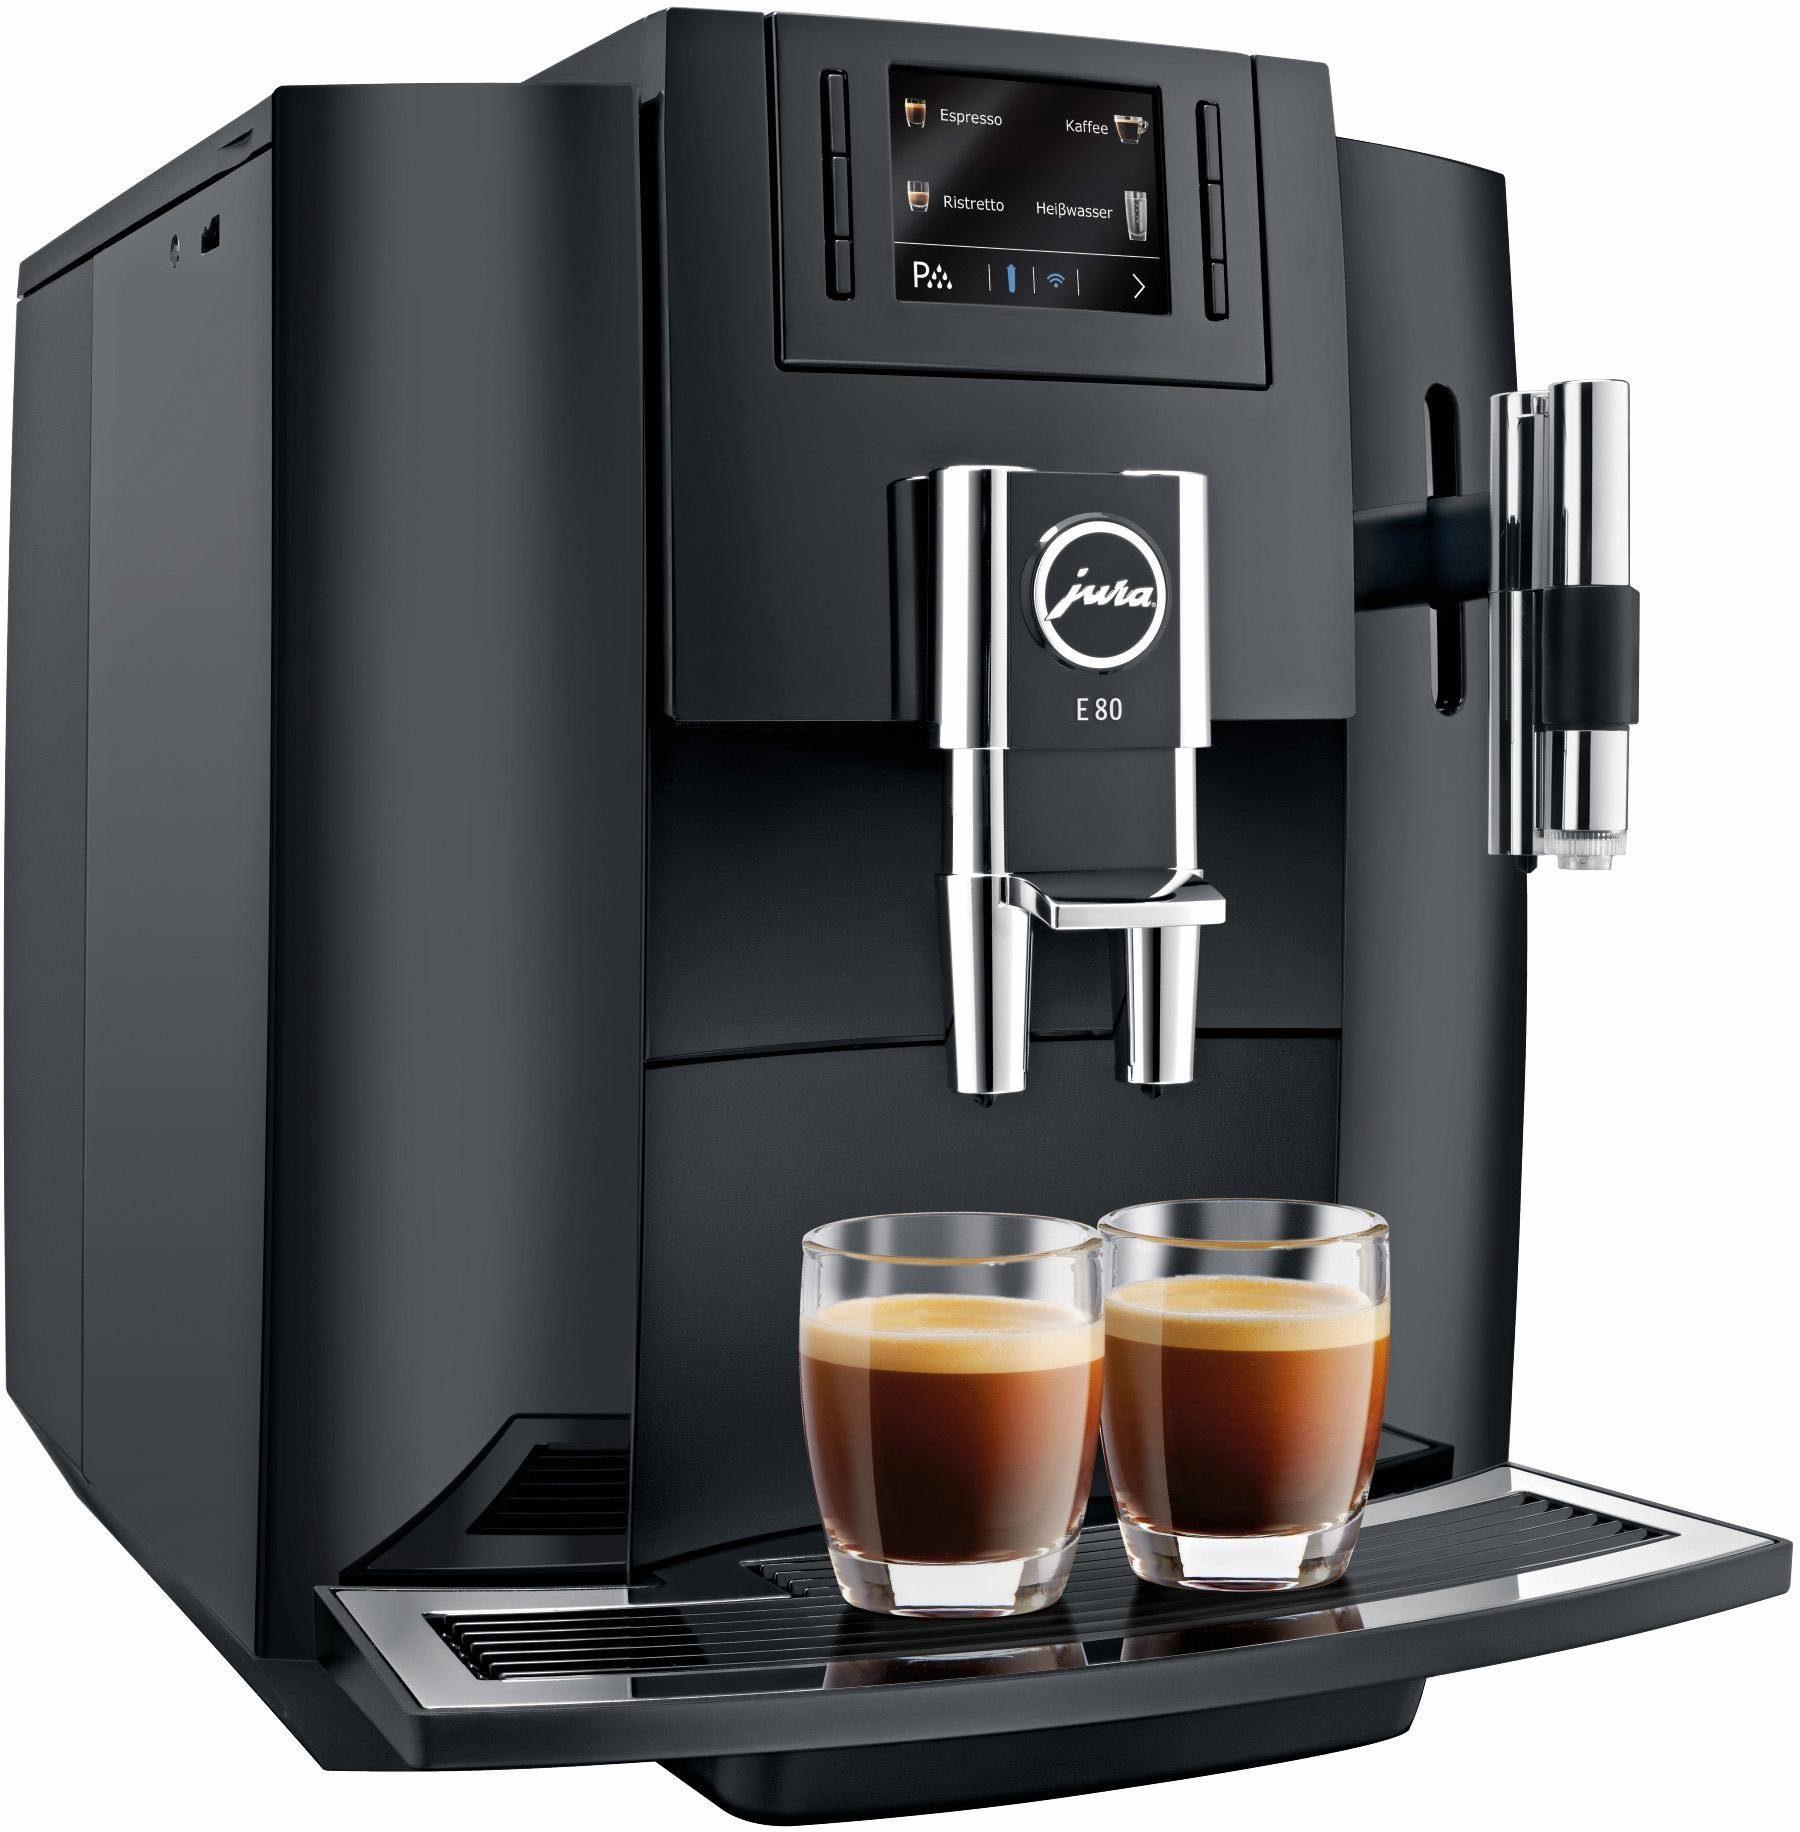 Jura Kaffeevollautomat 15083 E80